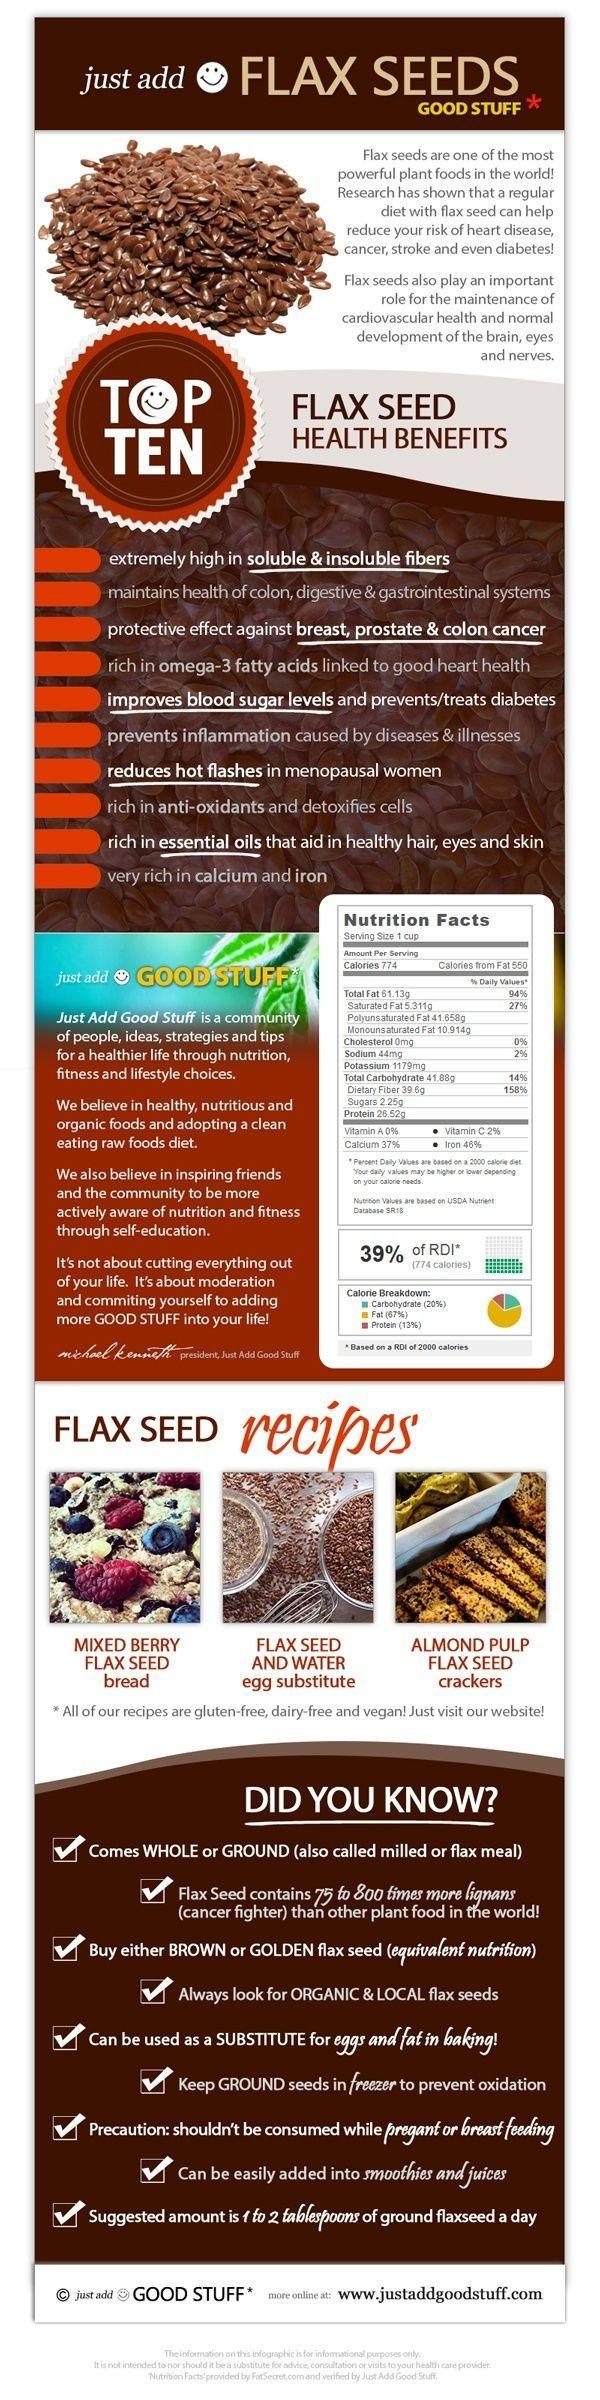 Top 10 Flax Seeds Health Benefits... #Flax_Seeds